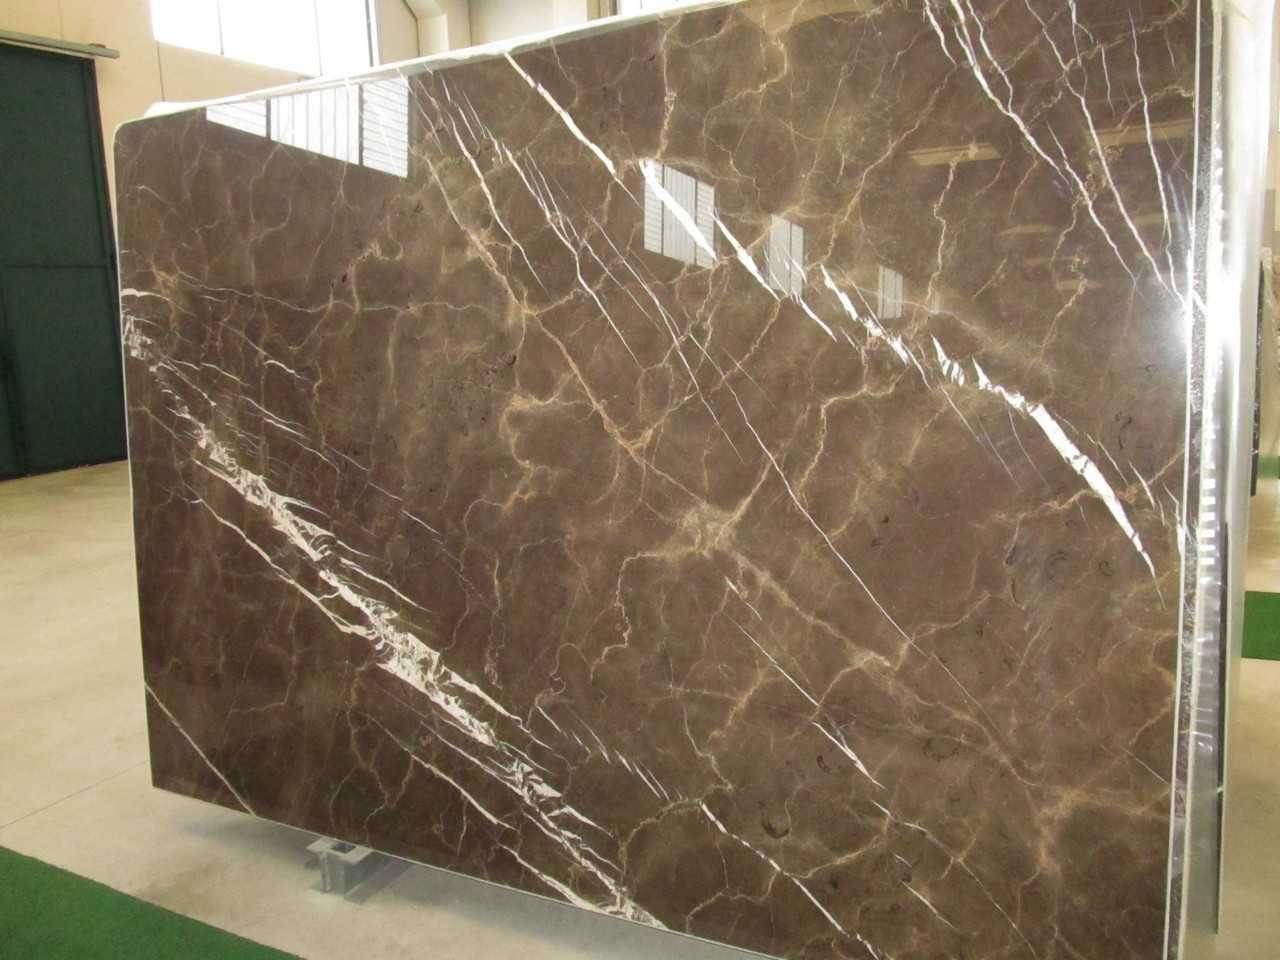 Coffee Brown Marble Coffee Brown Marble Price Smb Marble Marble Price Marble Bathroom Marble Slab